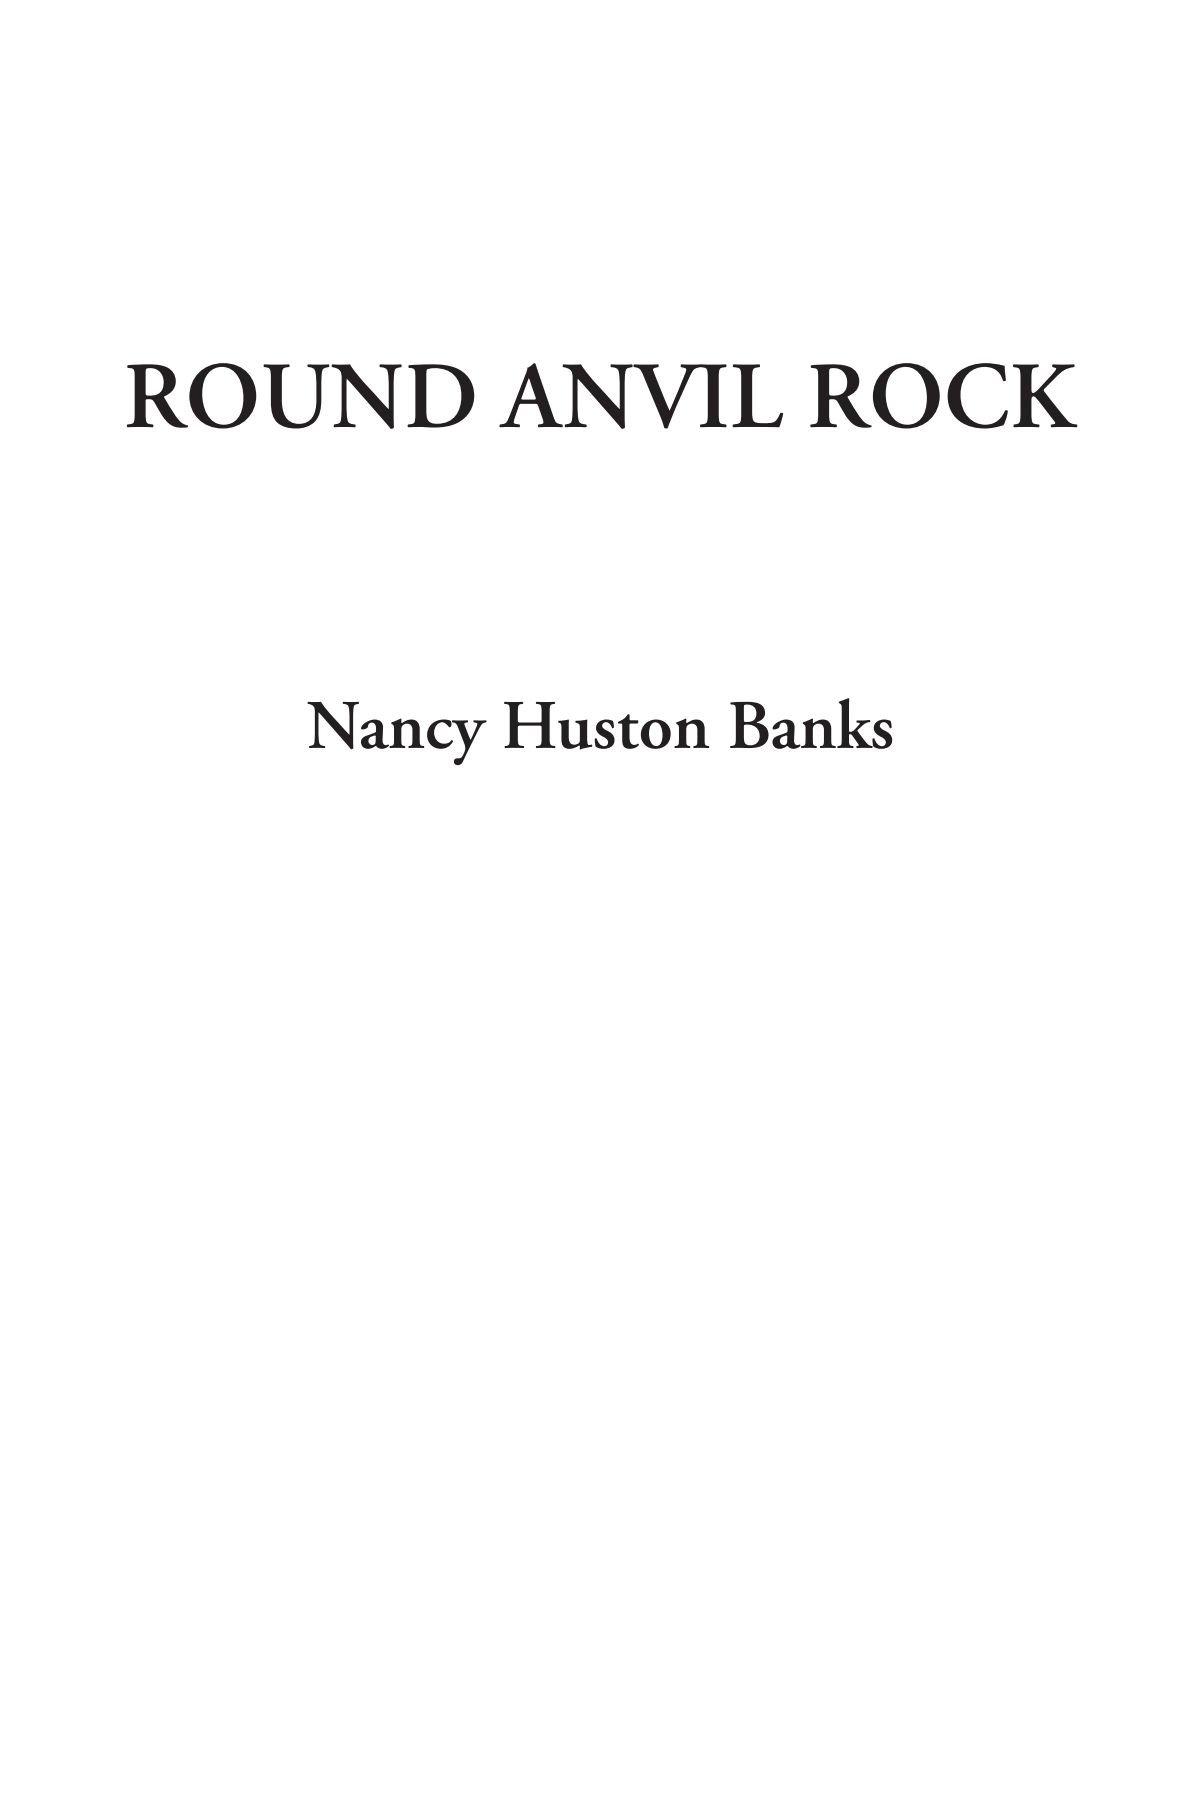 Download Round Anvil Rock ebook